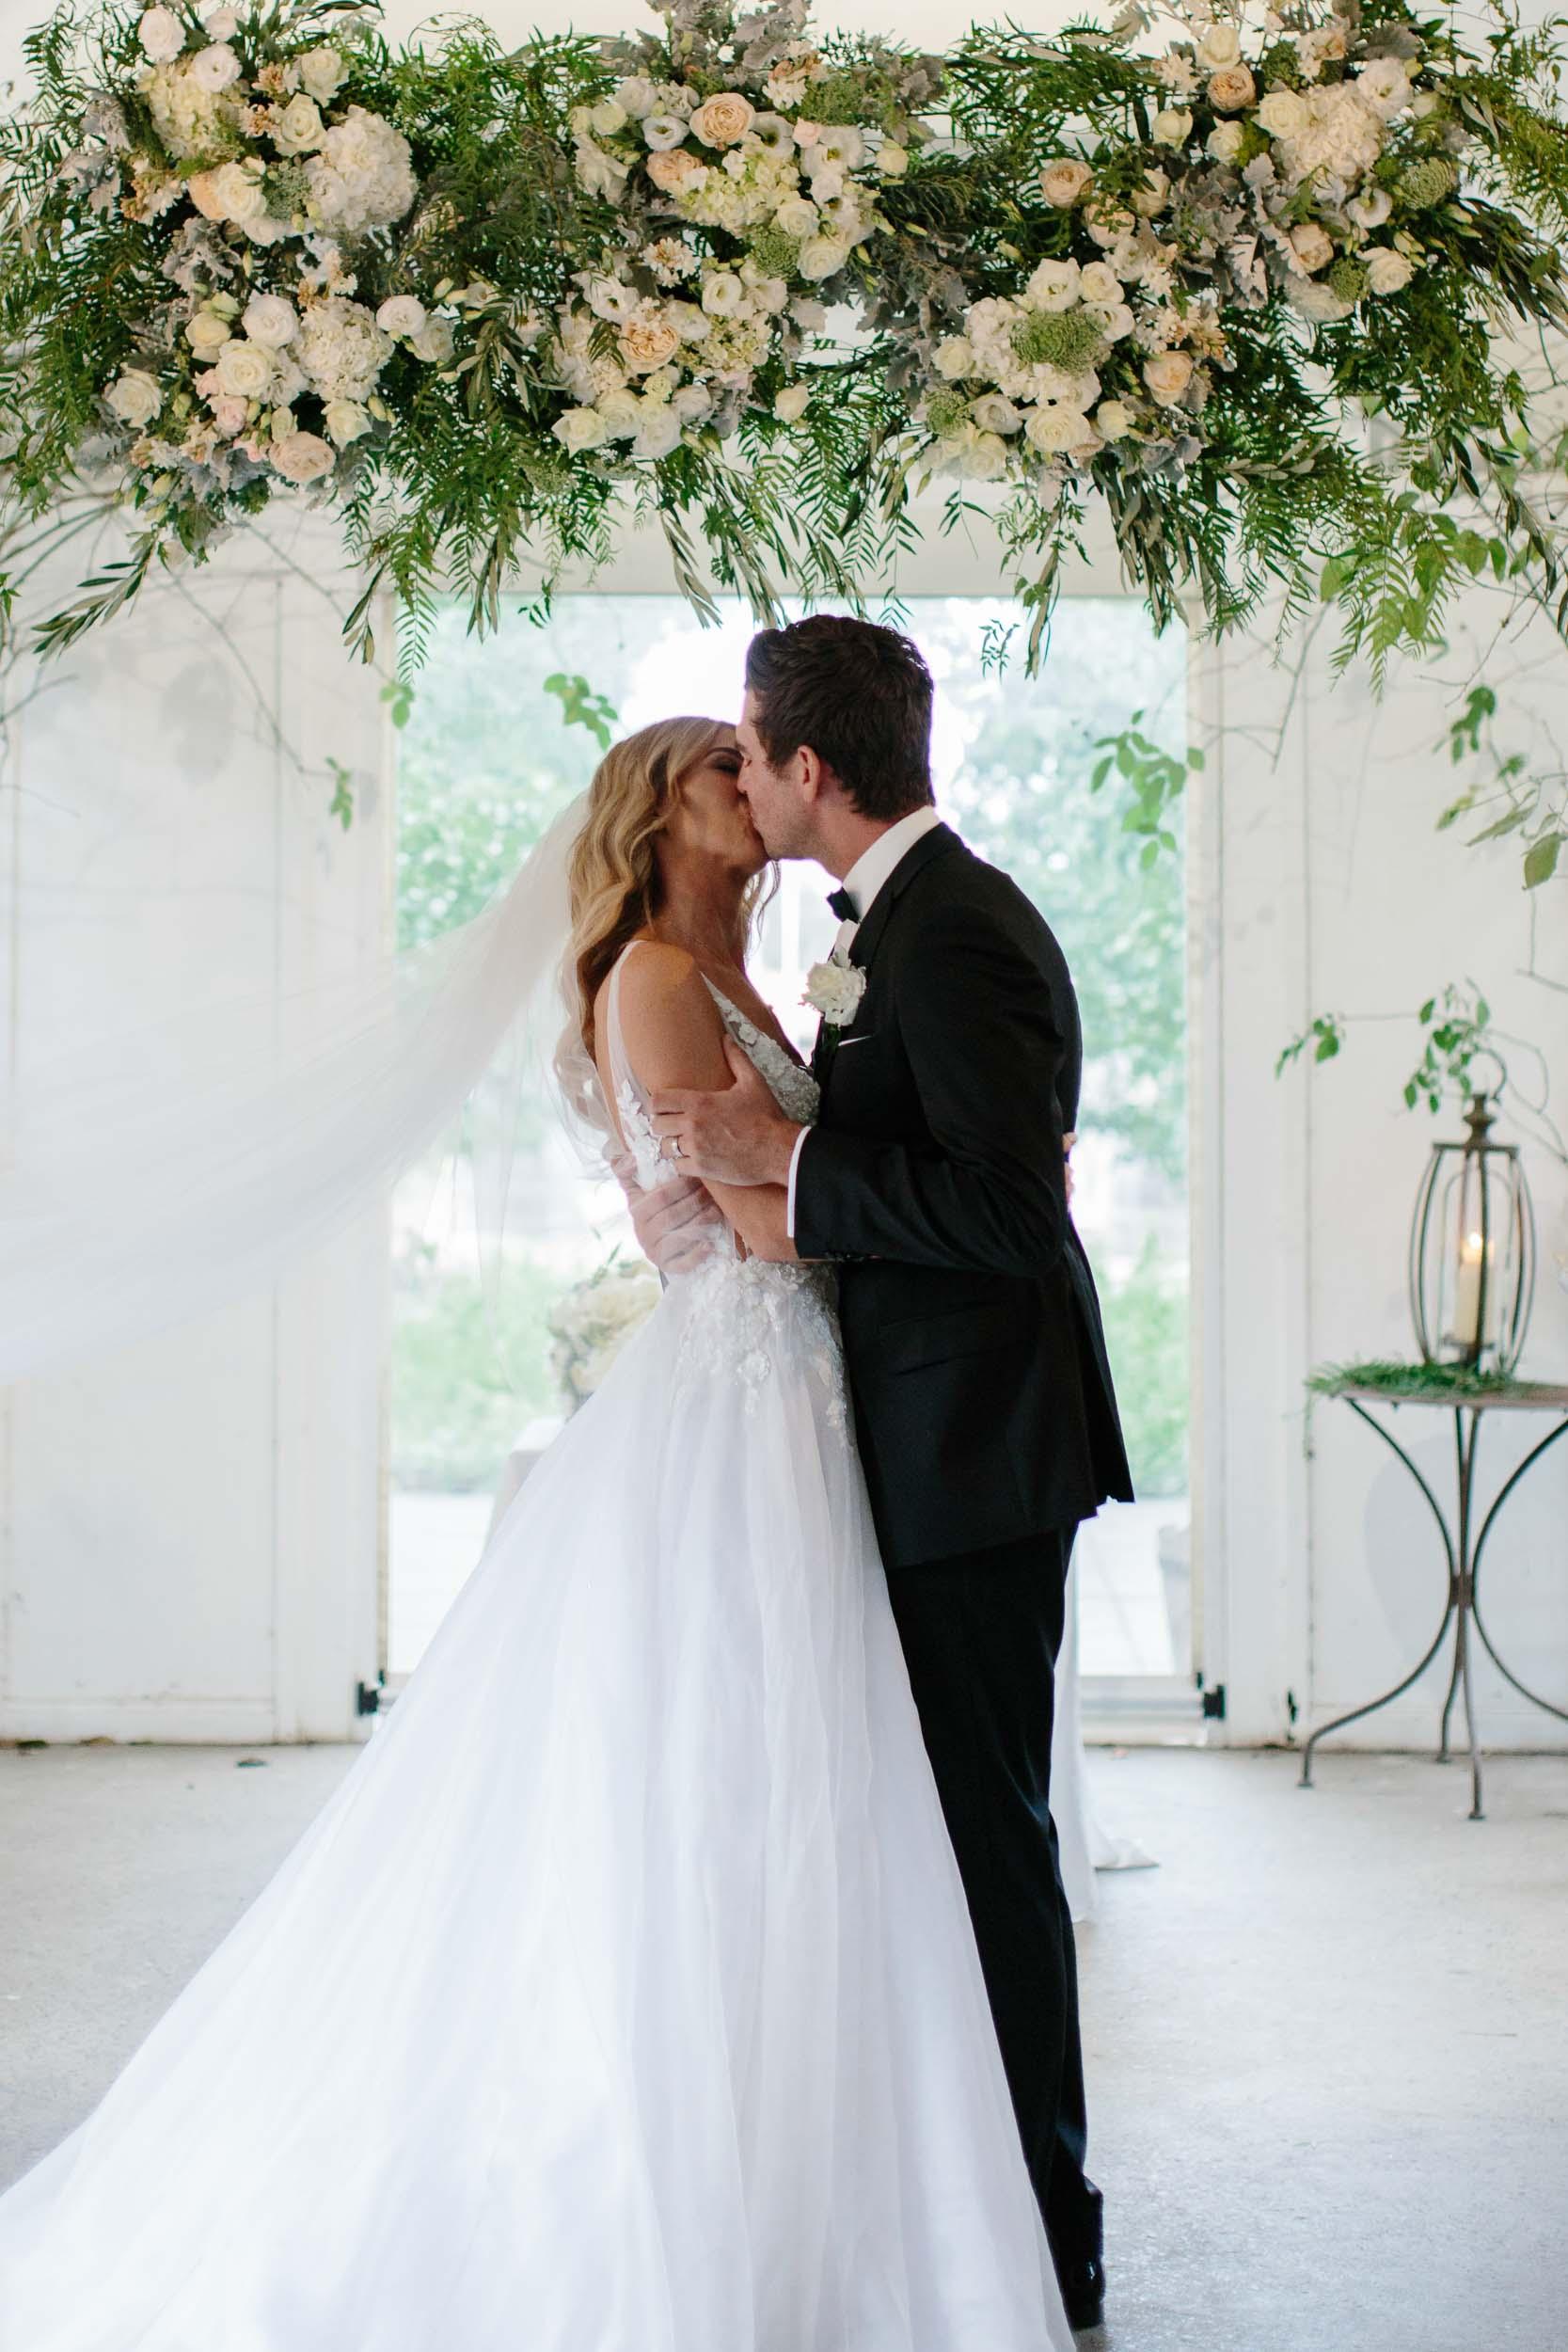 Kas-Richards-Mornington-Peninsula-Private-Property-Wedding-Marianna-Hardwick-Gown-289.jpg